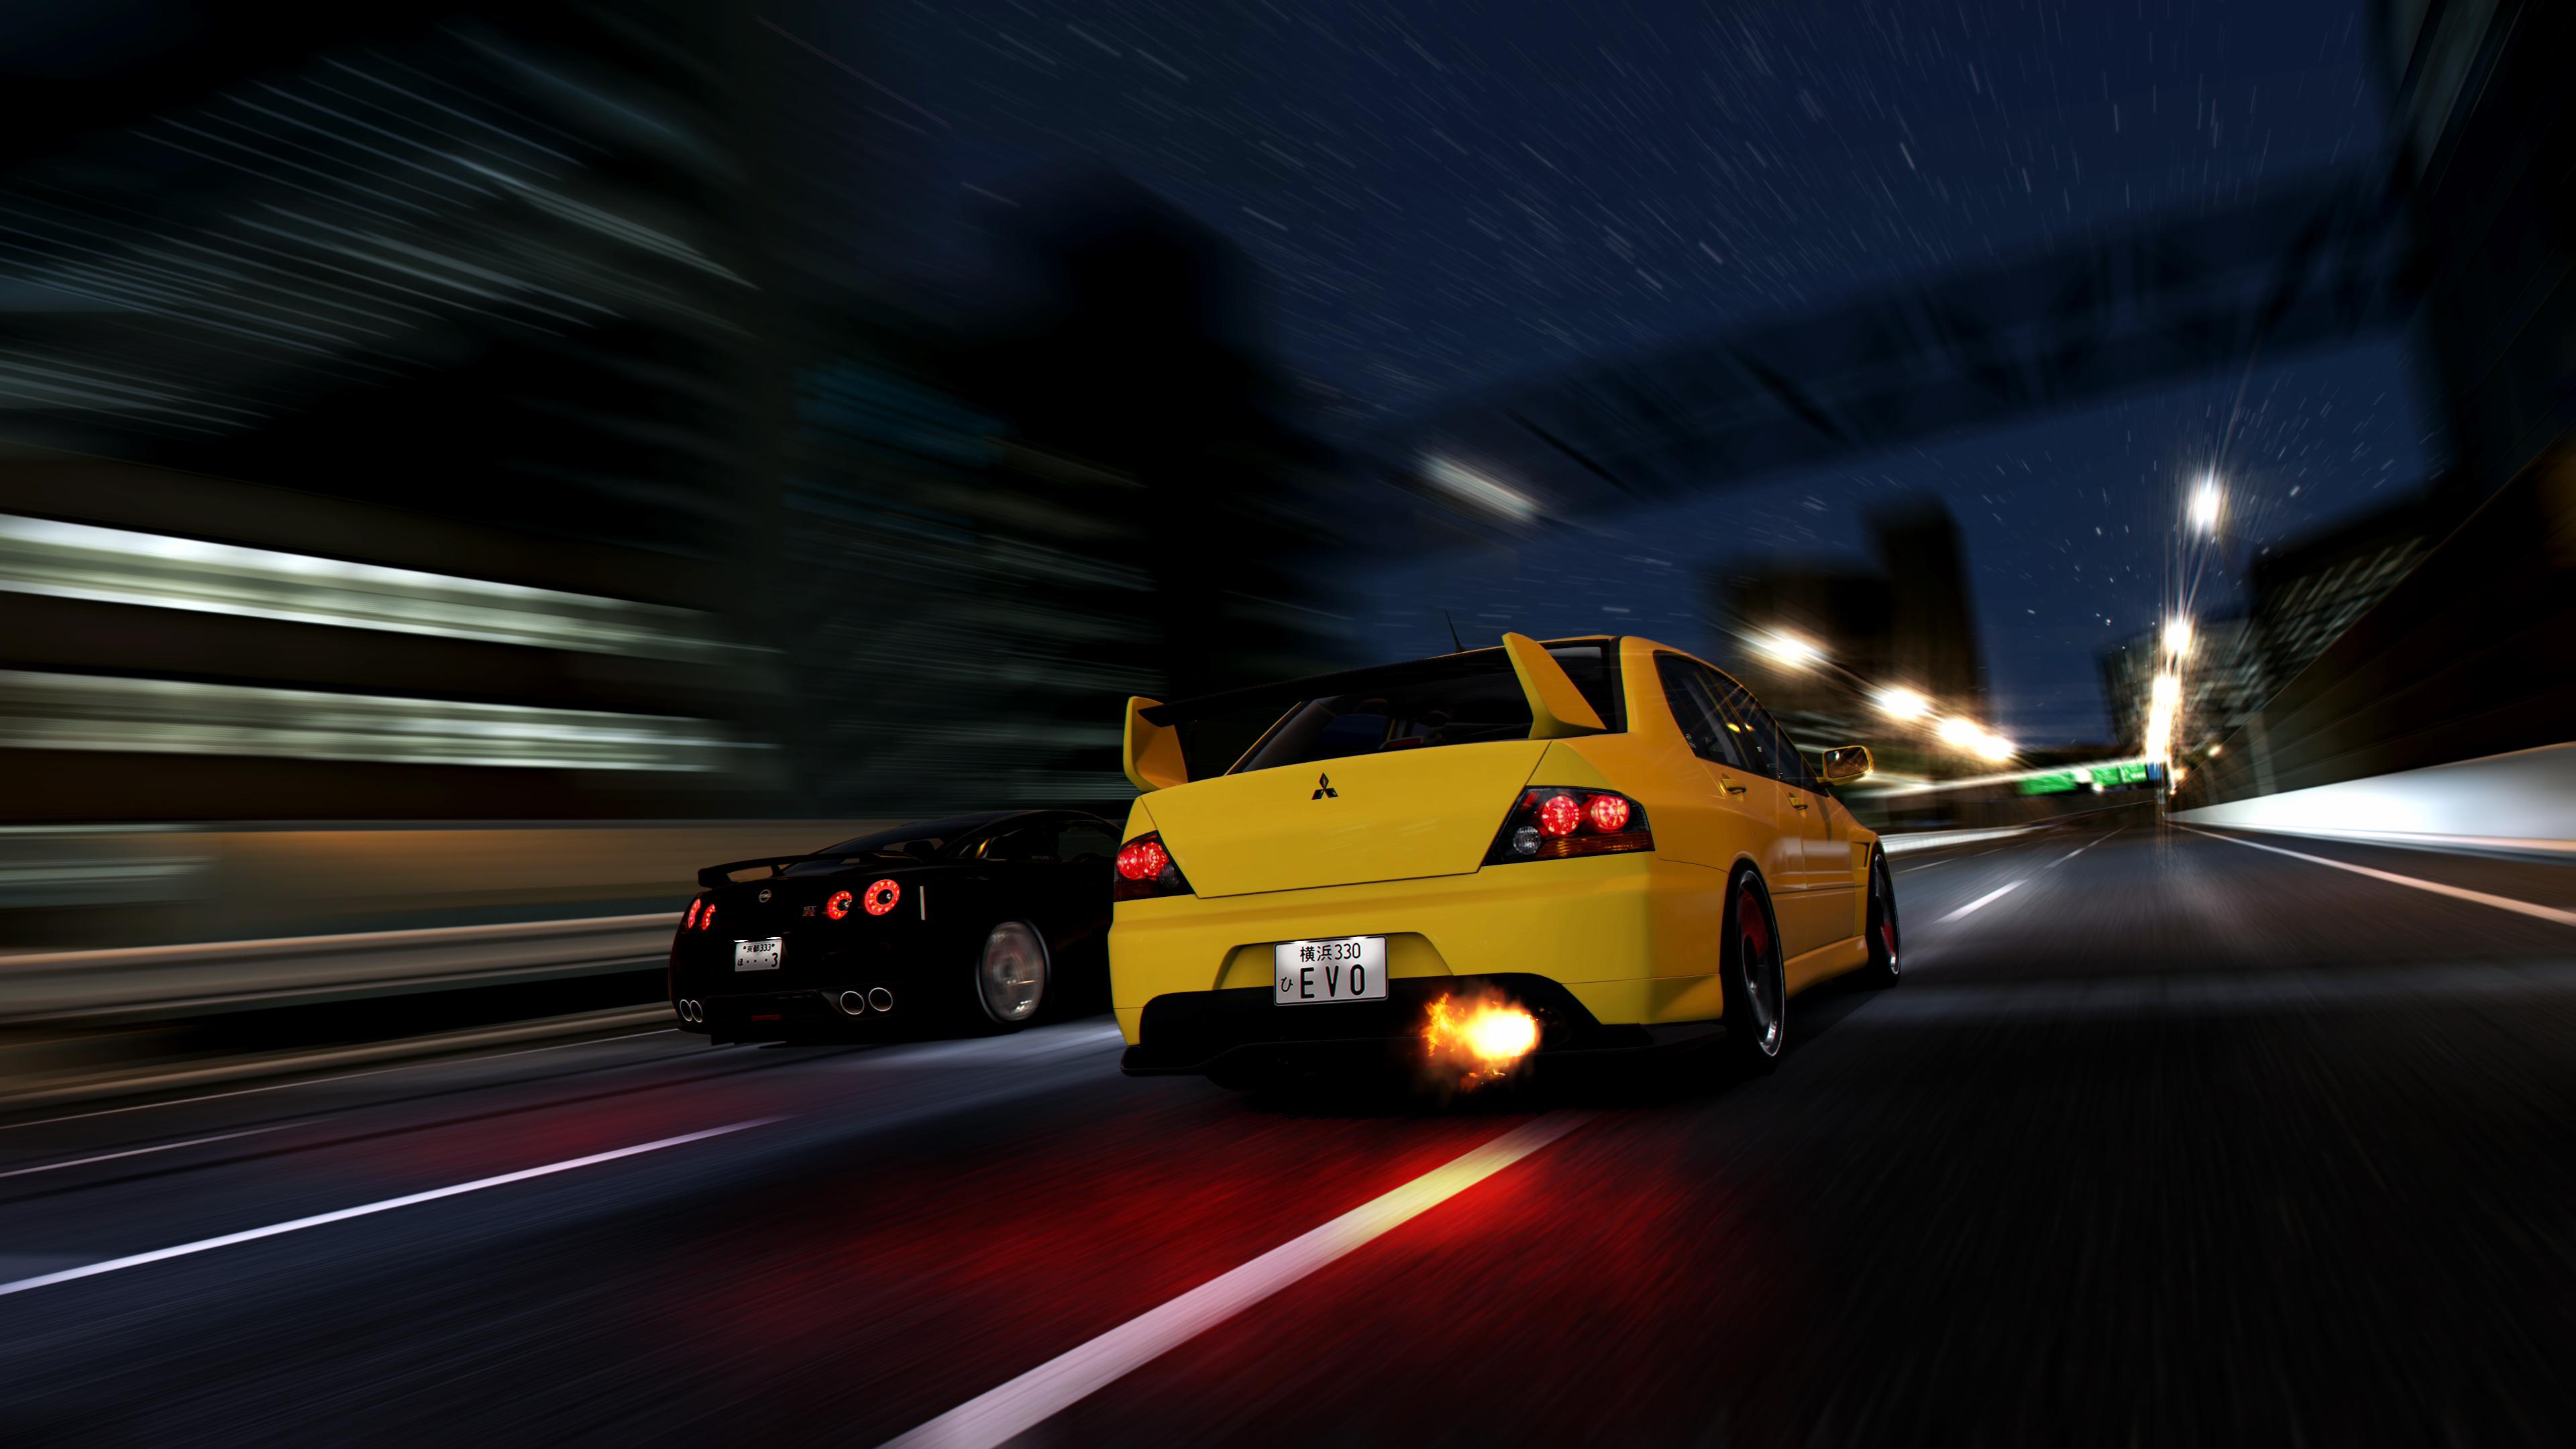 Wallpaper City Night Nissan Sports Car Mitsubishi